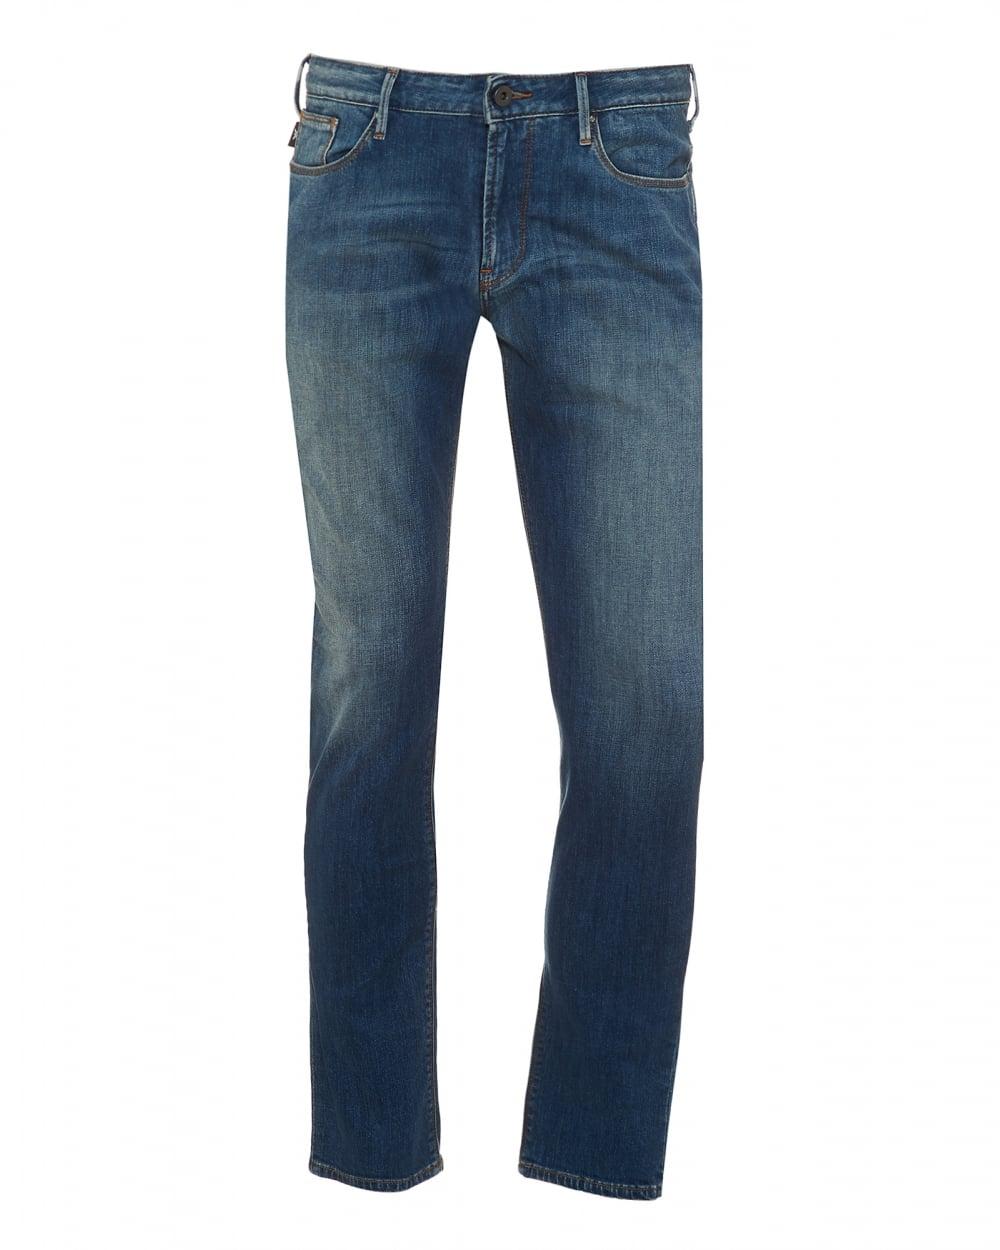 7c6ff3b0280 Emporio Armani Mens J06 Jeans